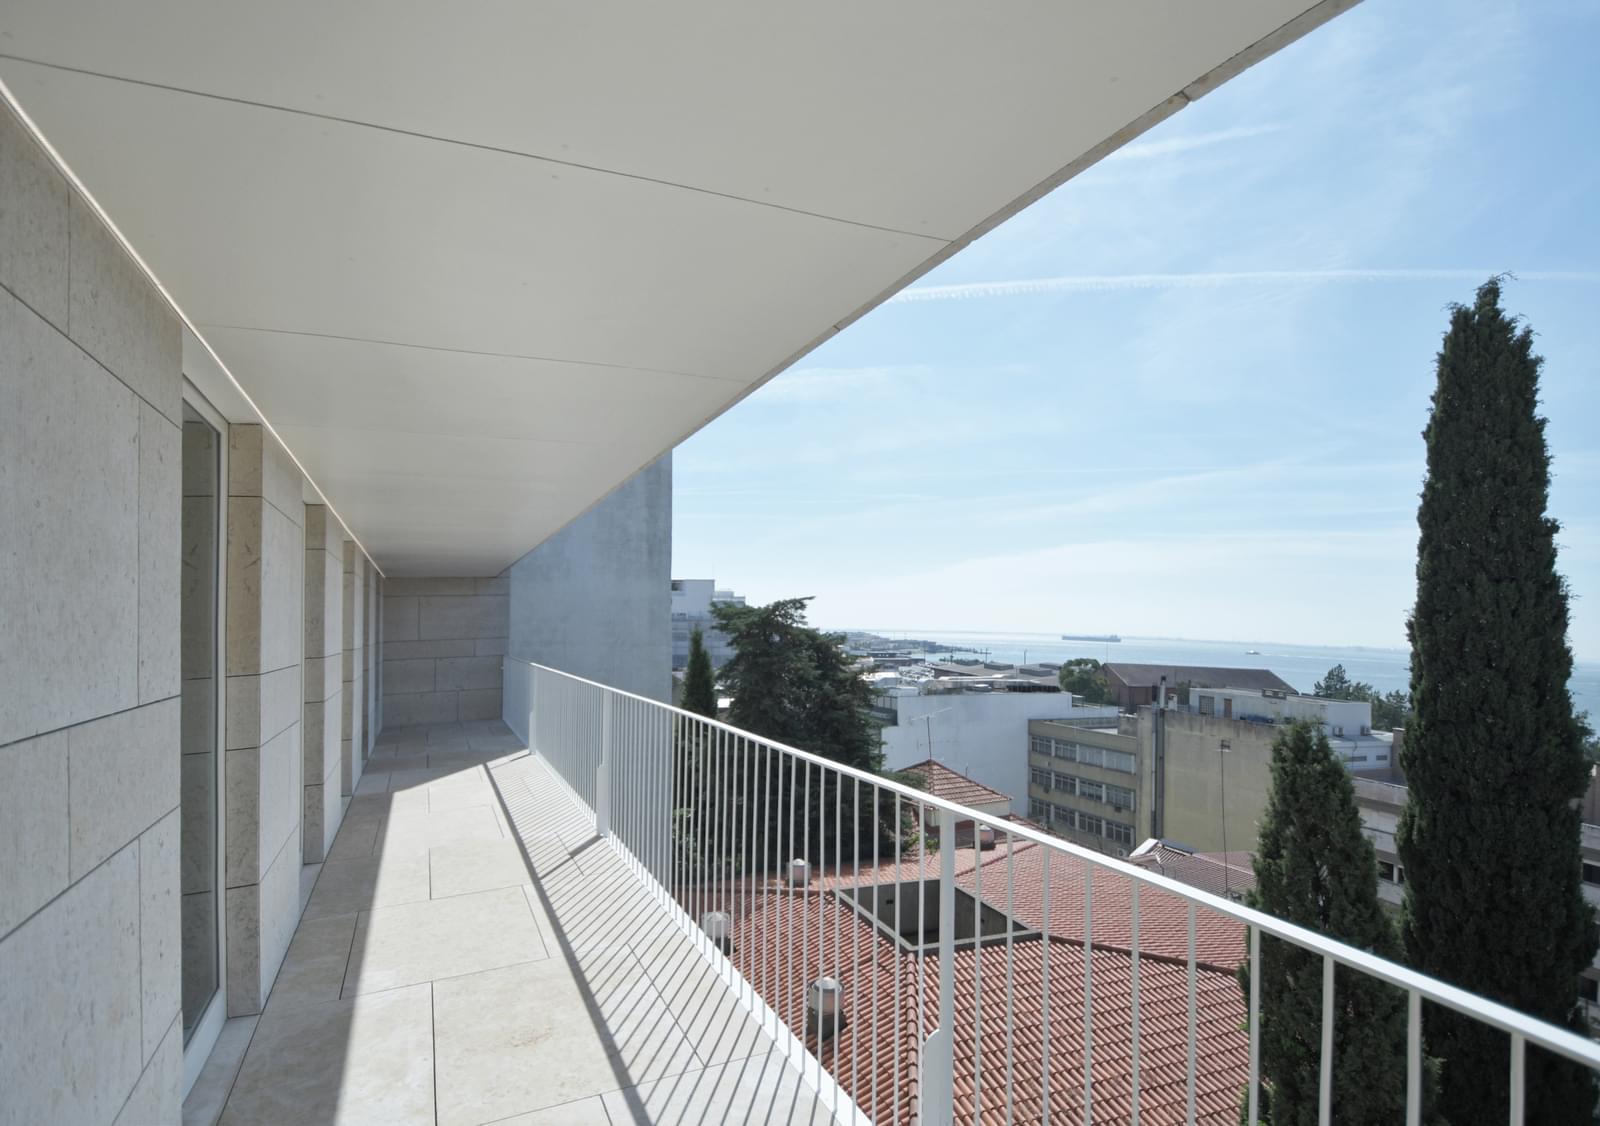 pf18051-apartamento-t4-lisboa-7e4ca4b8-794e-4ea6-b46d-a0339a1a1e98